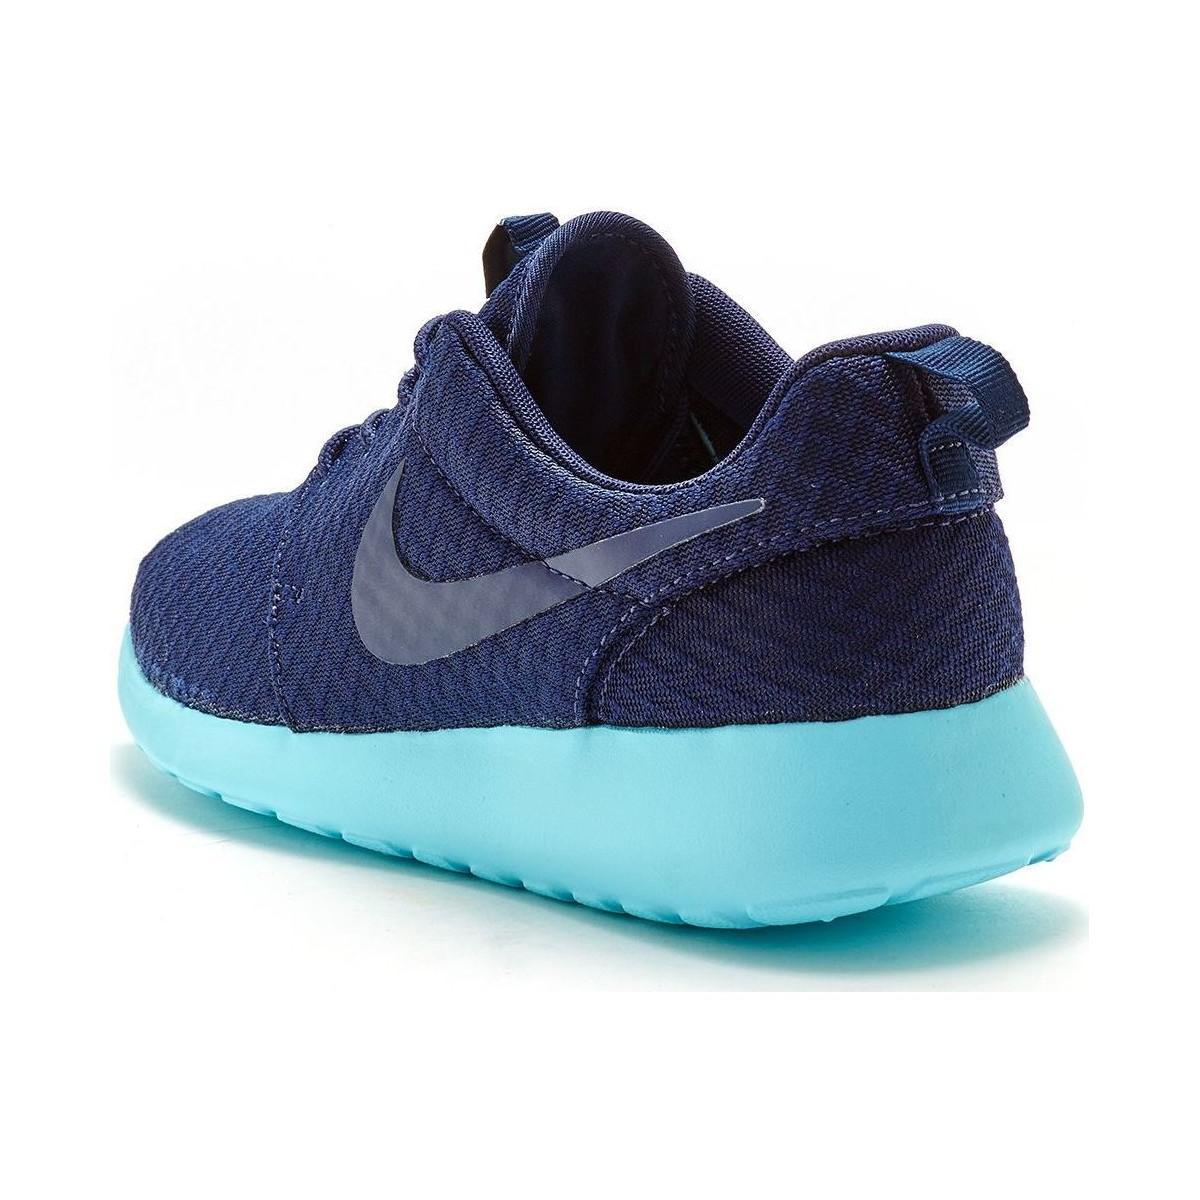 best website f56cf 498d4 Nike Roshe One Women Trainers In Midnight Navy Tide Pool Blue 5118 ...